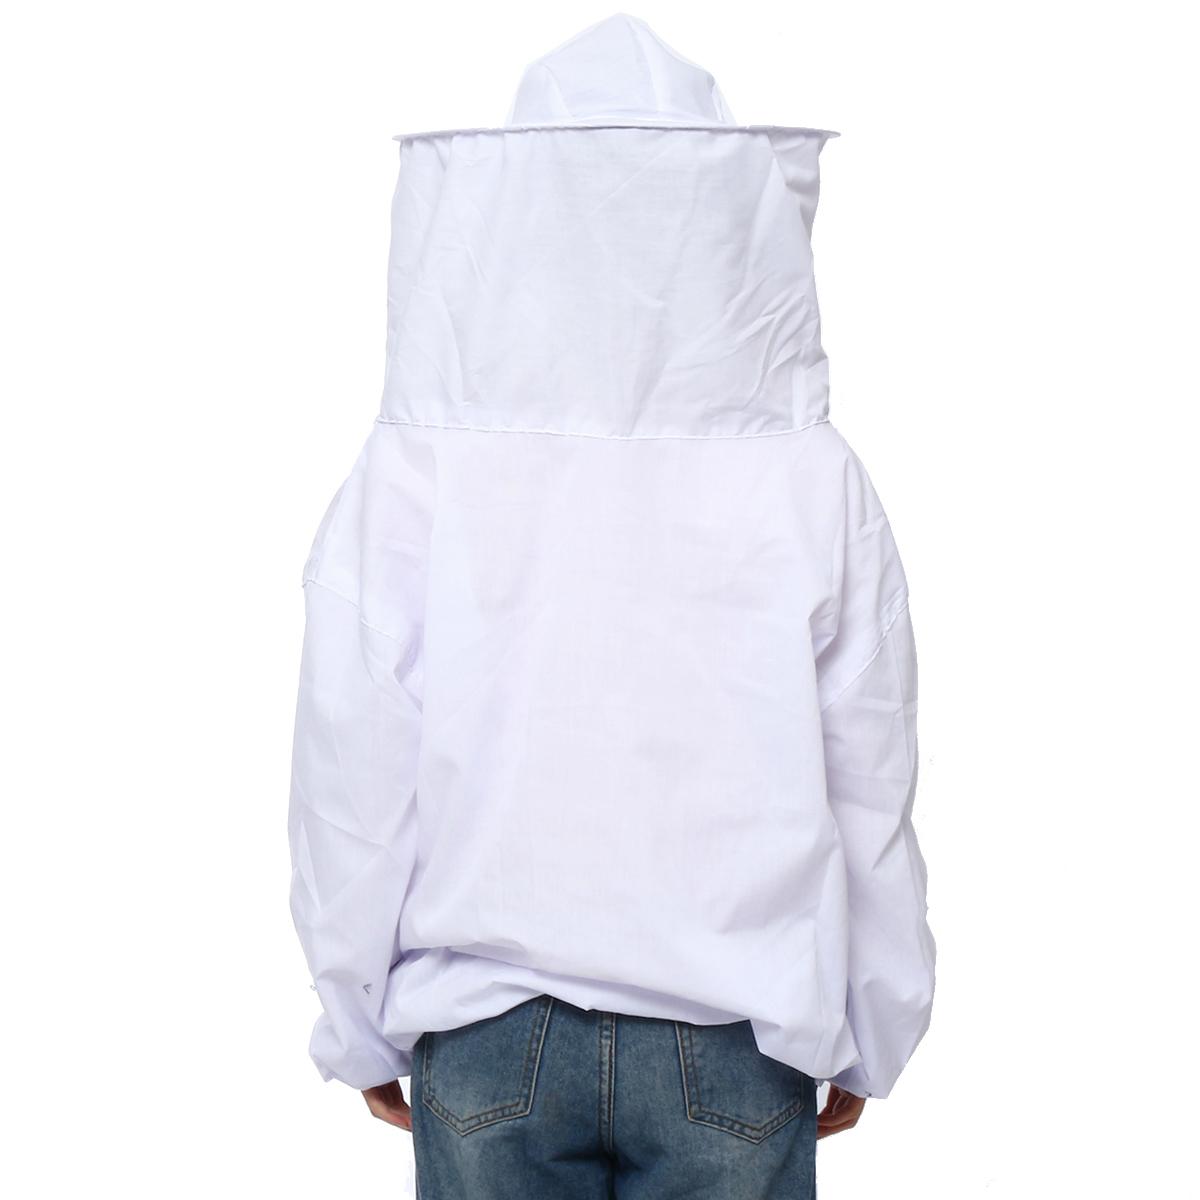 4Pcs Safe Bee-Proof BeeKeeping Veil Hat Suit Work Gloves Bee Hive Brush J Hook Tool